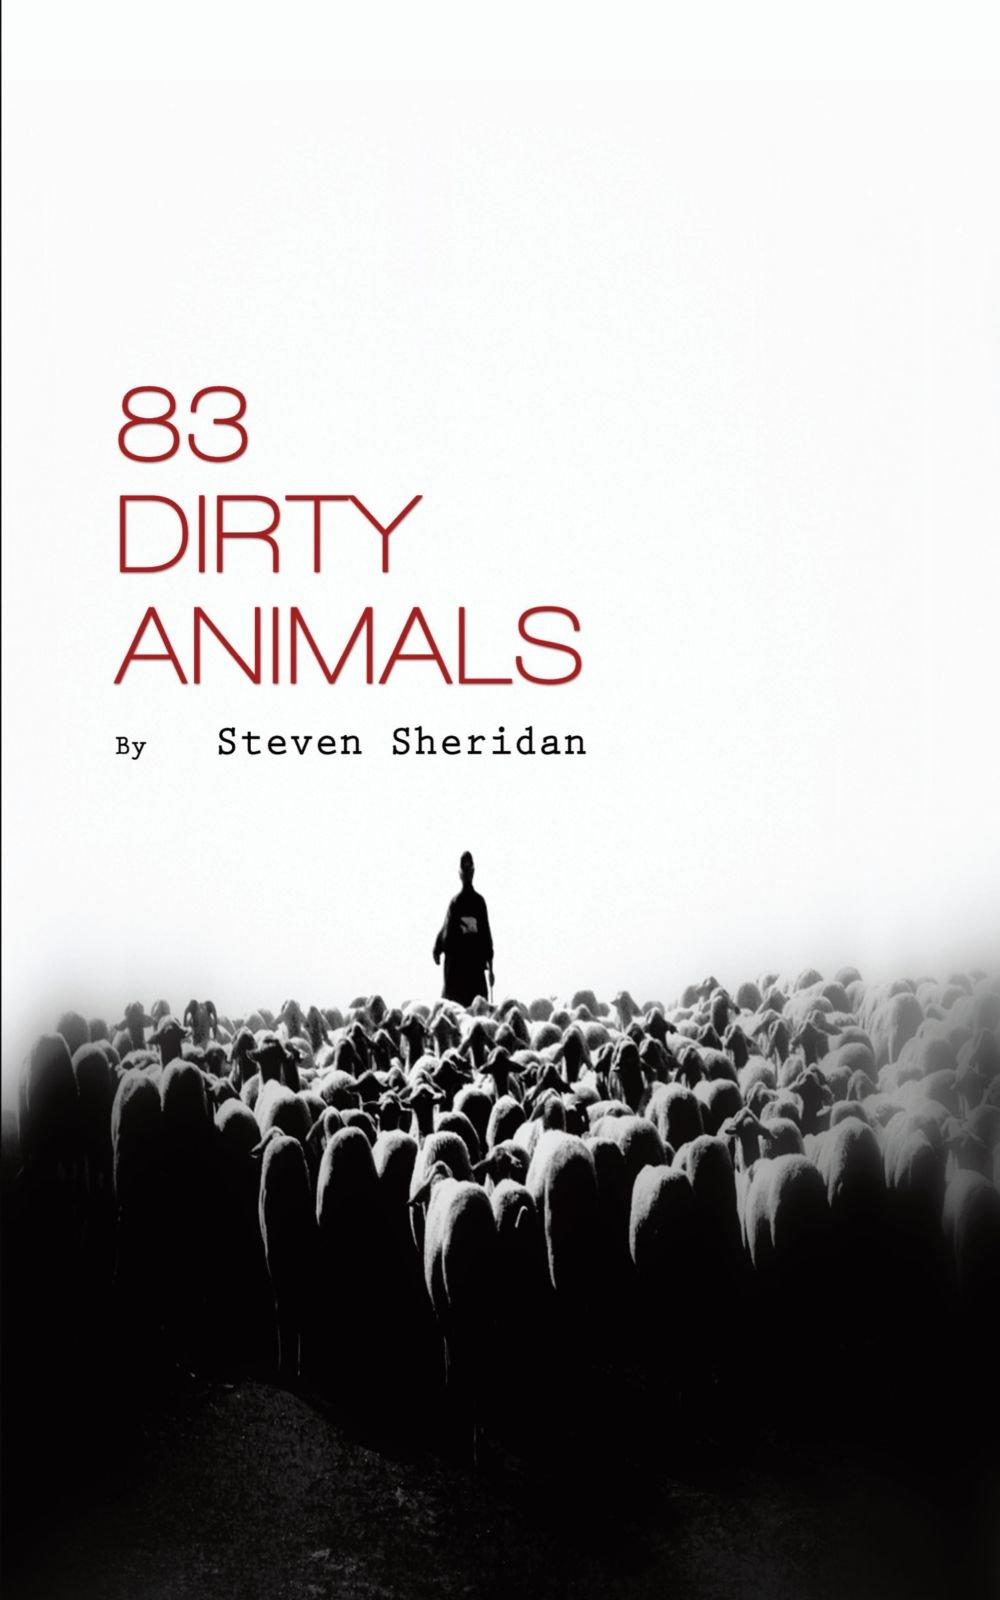 83 Dirty Animals